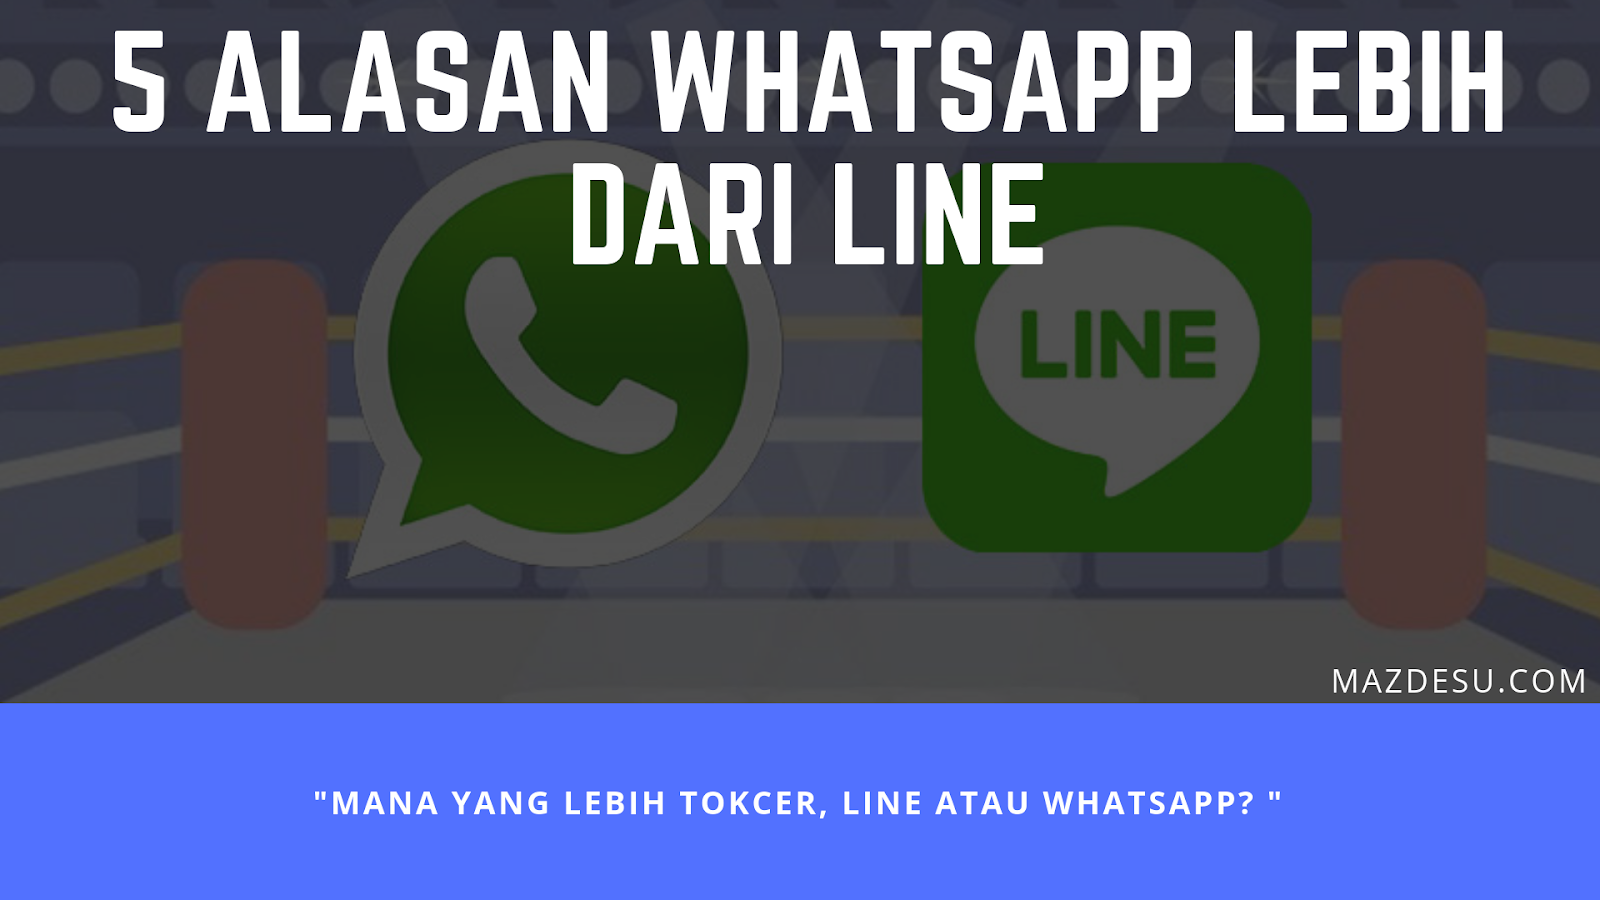 5 Alasan Whatsapp Lebih dari Line